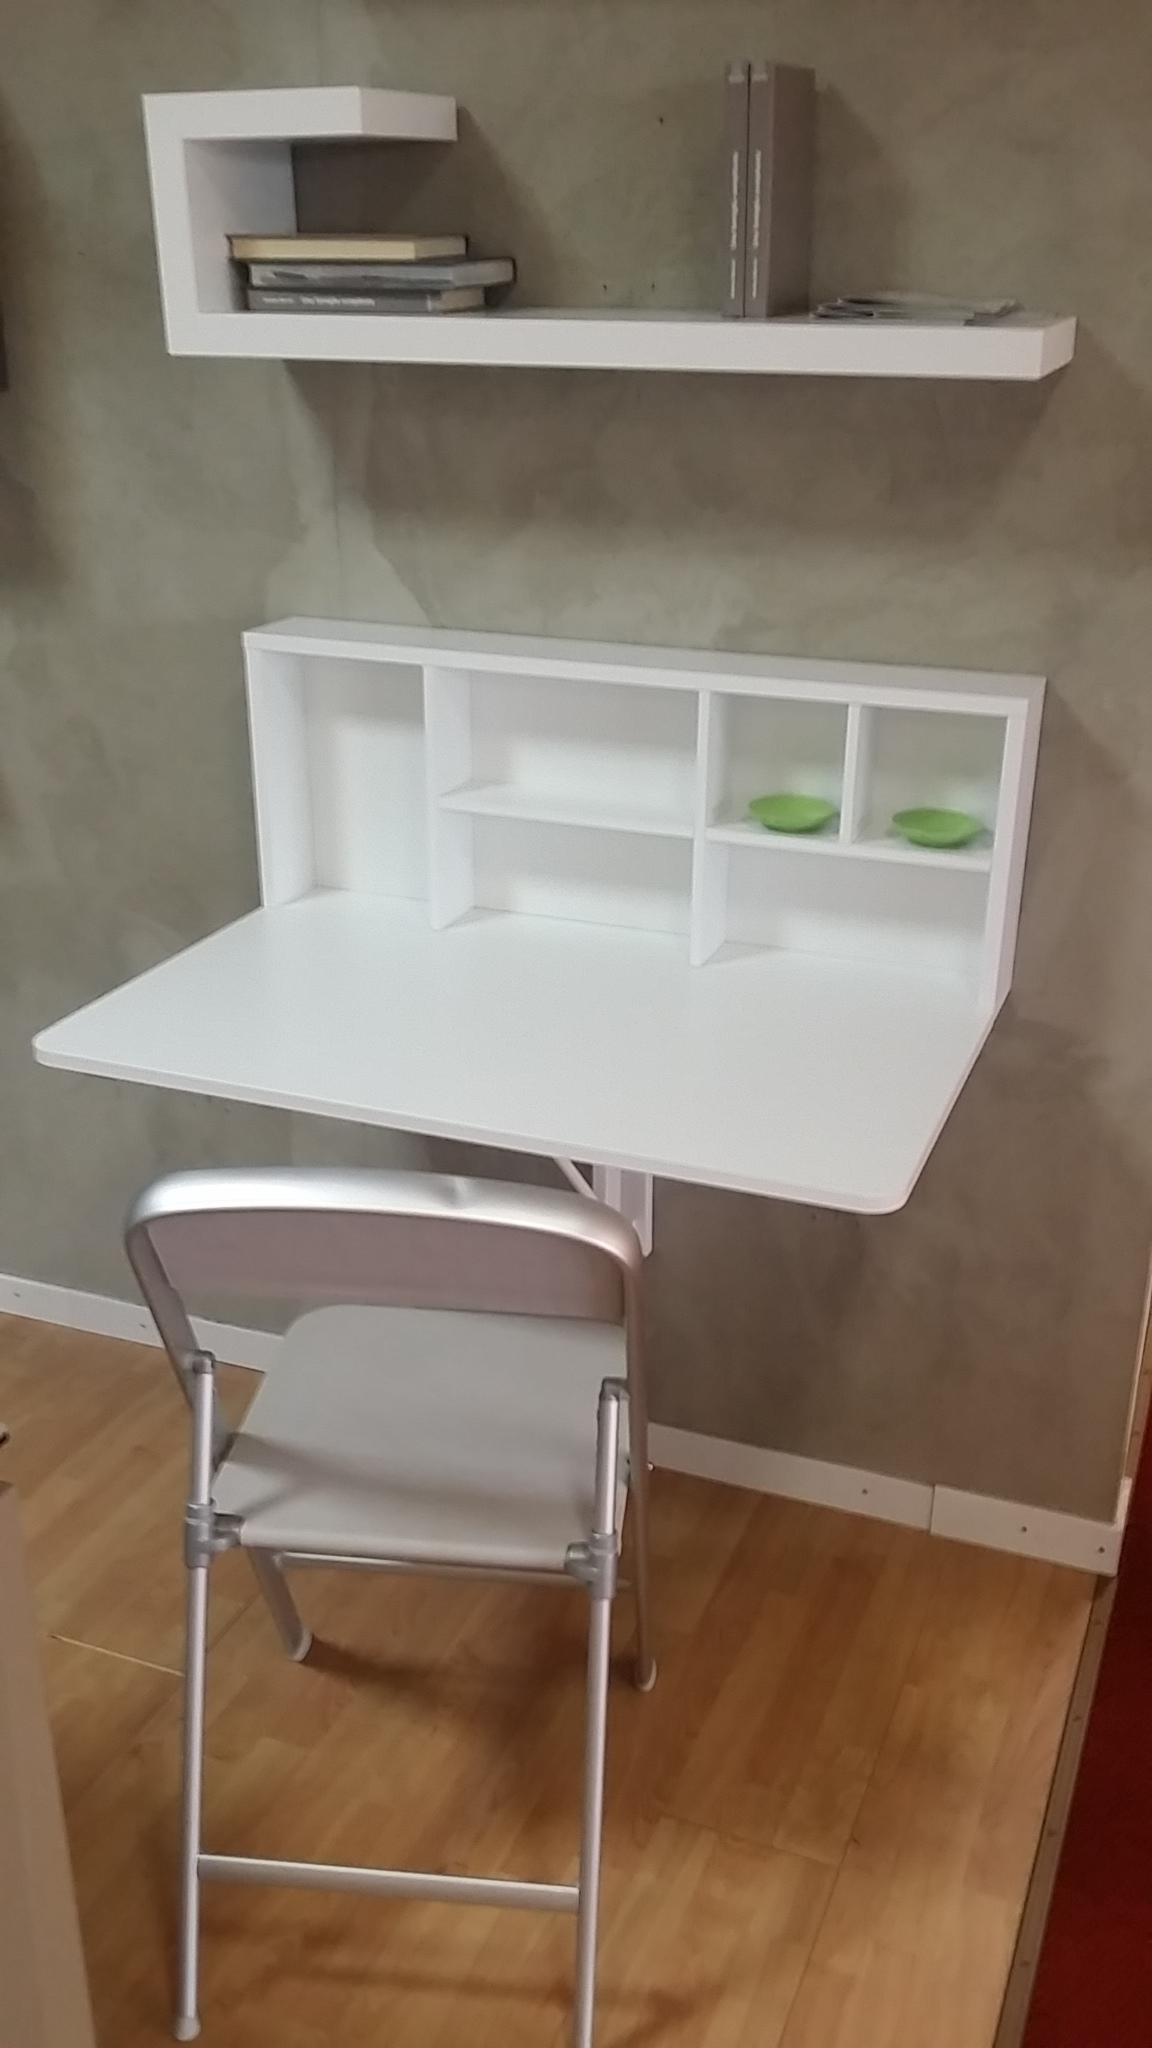 Outlet tavolo calligaris spacebox tavoli a prezzi scontati - Tavolo a ribalta calligaris ...